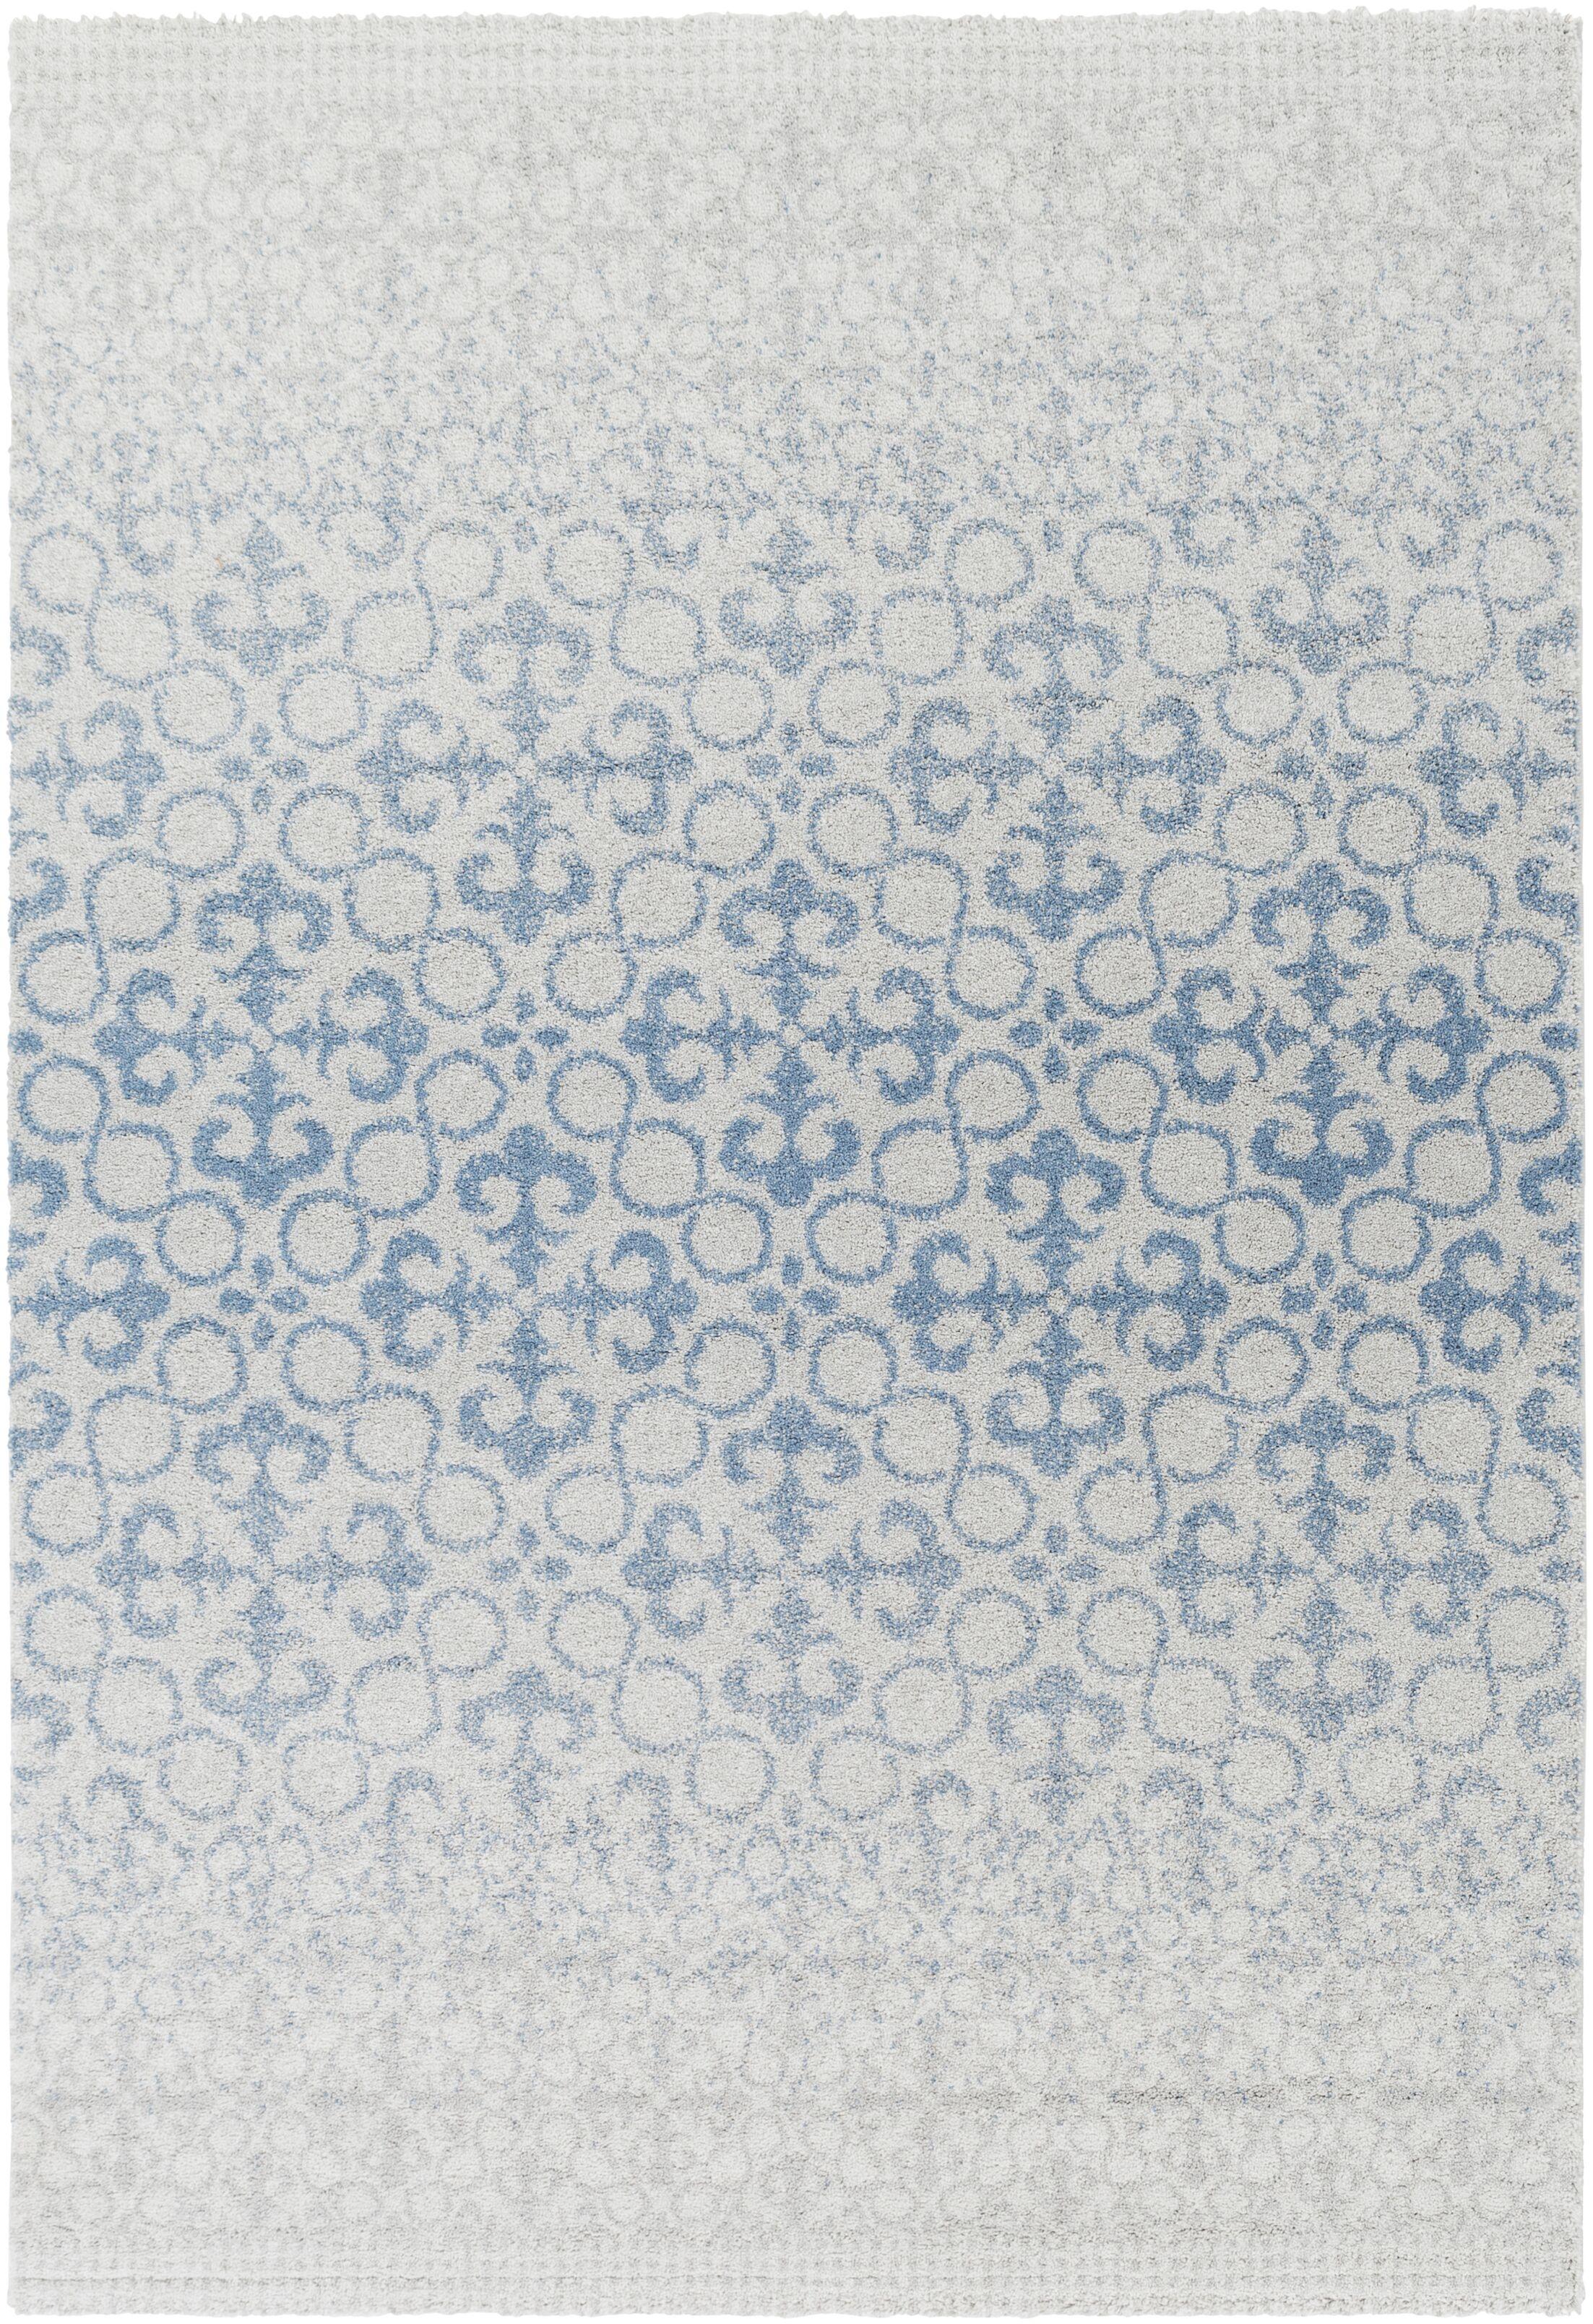 Upton Cheyney Gray Area Rug Rug Size: Rectangle 2' x 3'6